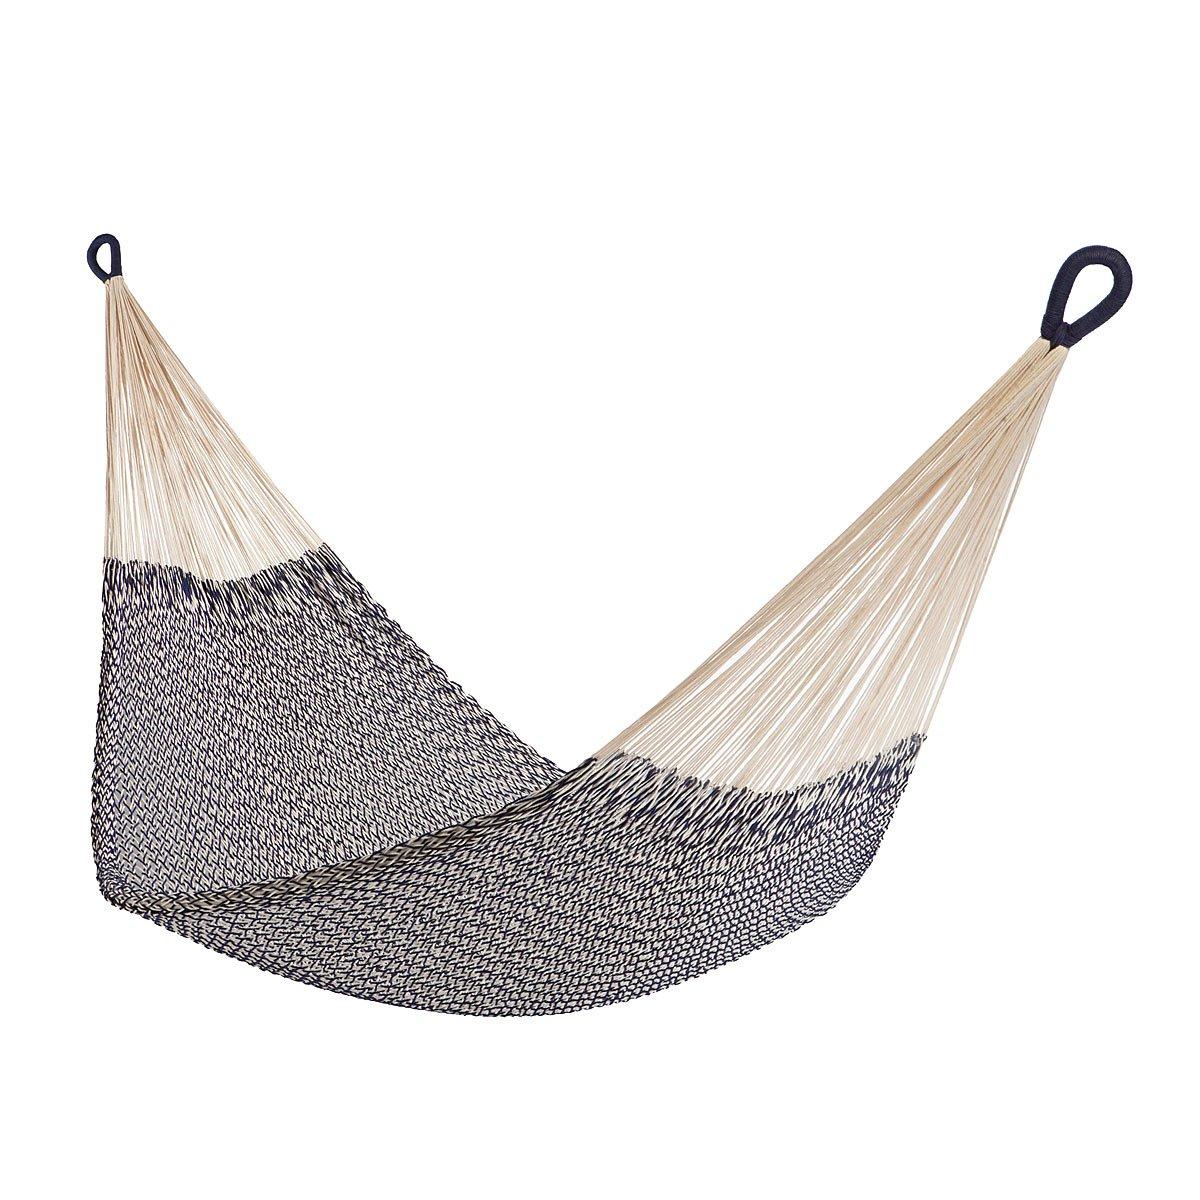 do good cotton hammock 1 thumbnail do good cotton hammock   double hammock thailand culture      rh   un mongoods